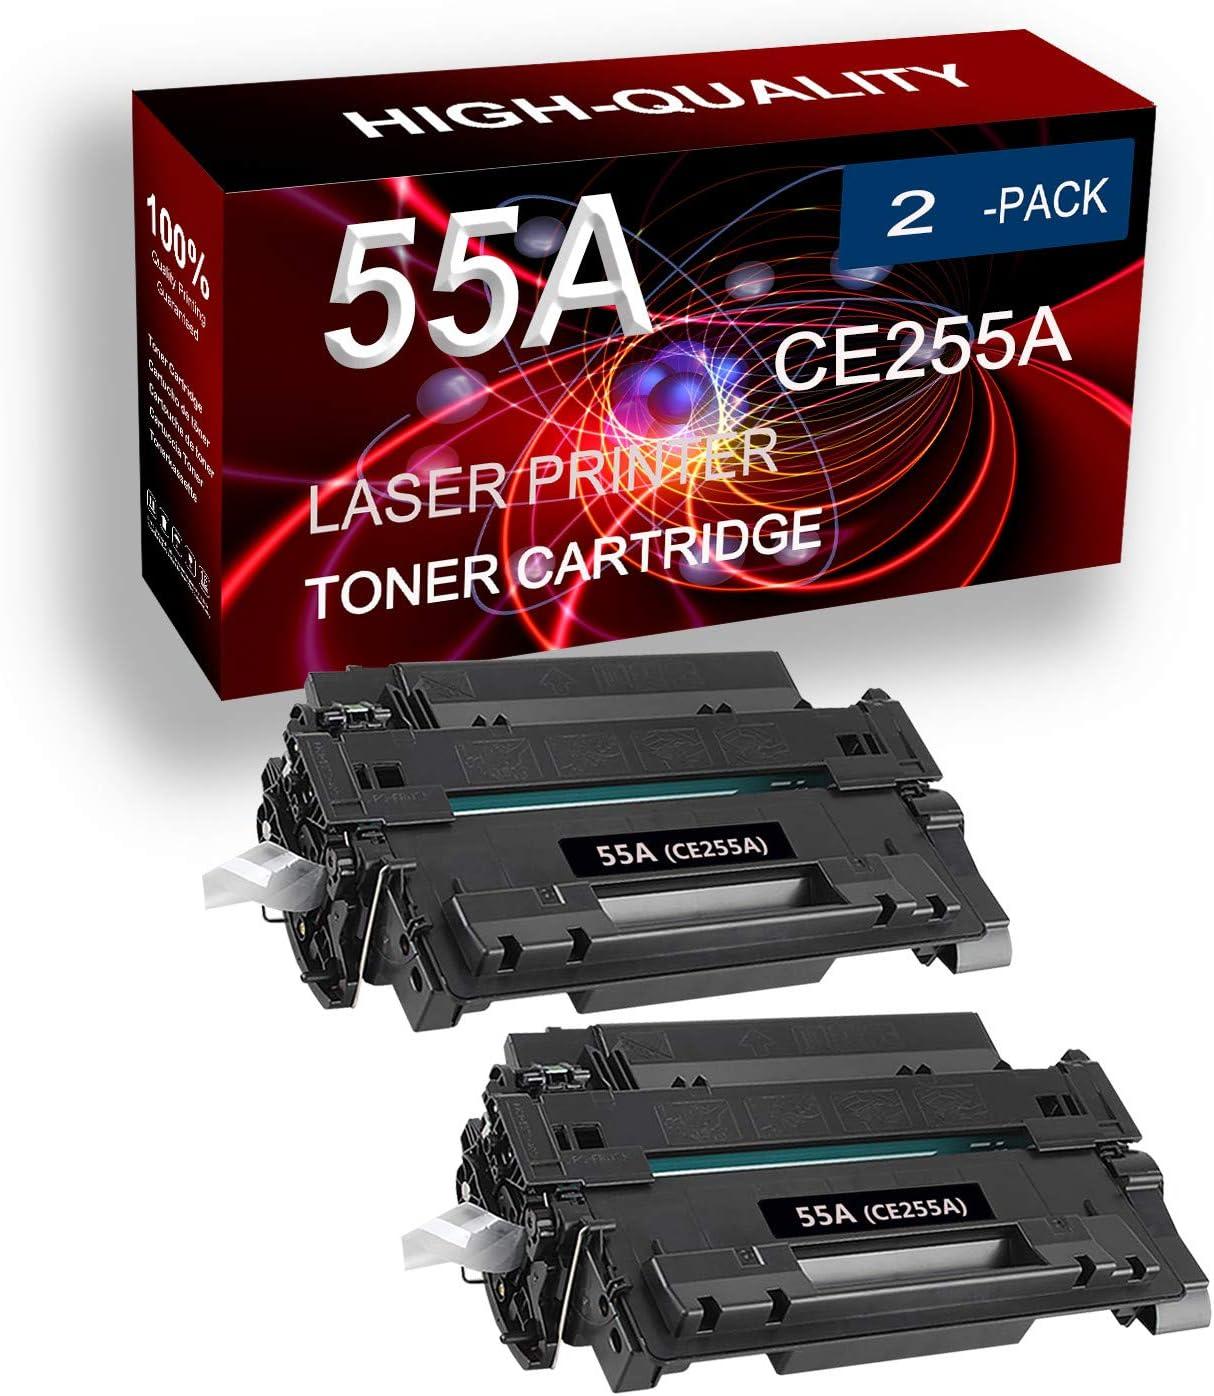 2 Pack (Black) Compatible P3010 P3011 P3015 P3016 500 MFP M521 500 MFP M525 Printer Toner Cartridge (High Capacity) Replacement for HP 55X 55A CE255A Laser Printer Toner Cartridge